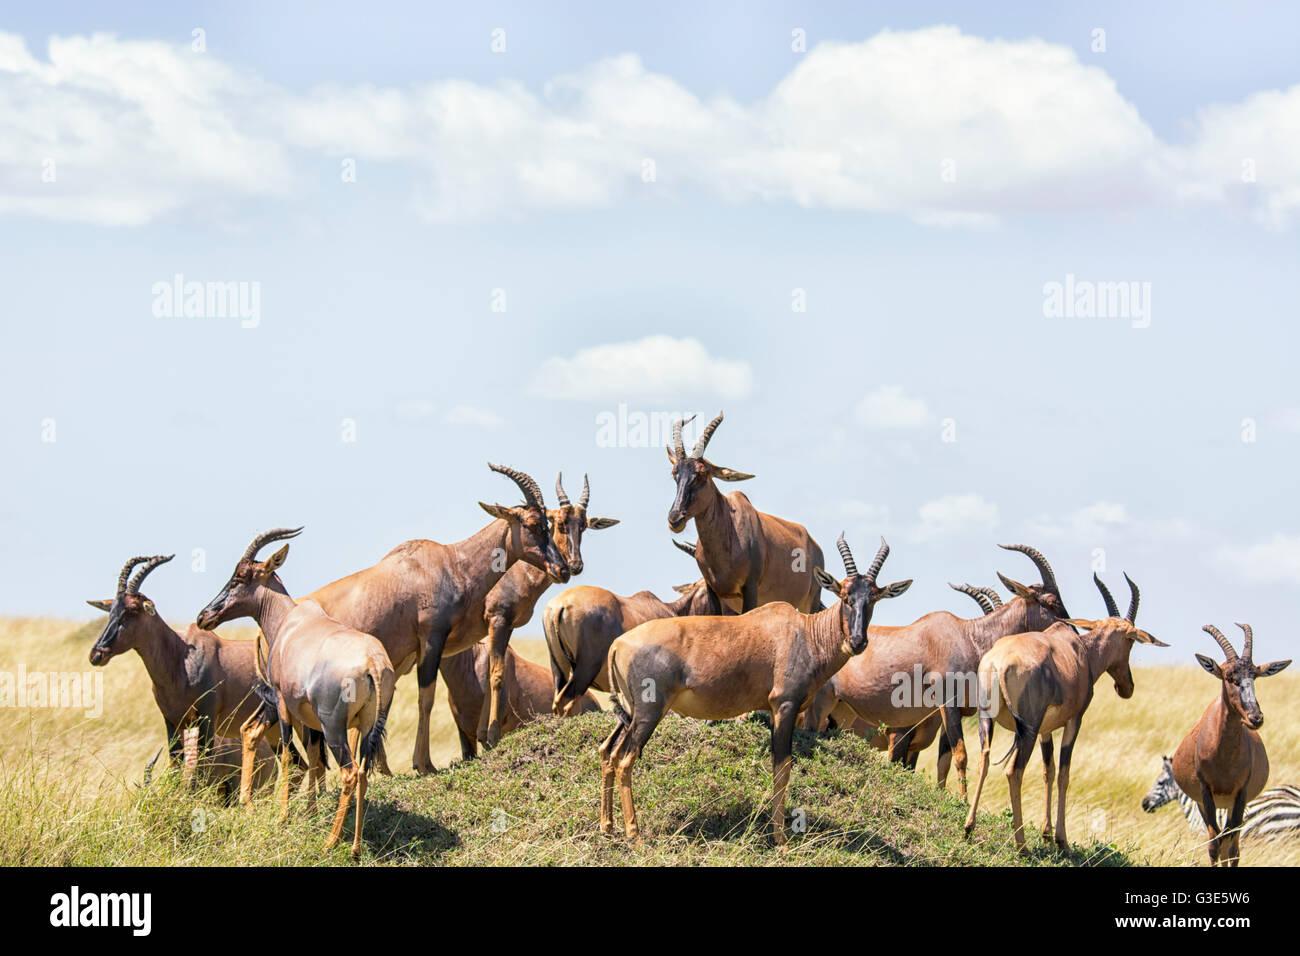 Herd of Topi, Damaliscus lunatus, gathered on a termite mound in the Masai Mara, Kenya, East Africa - Stock Image